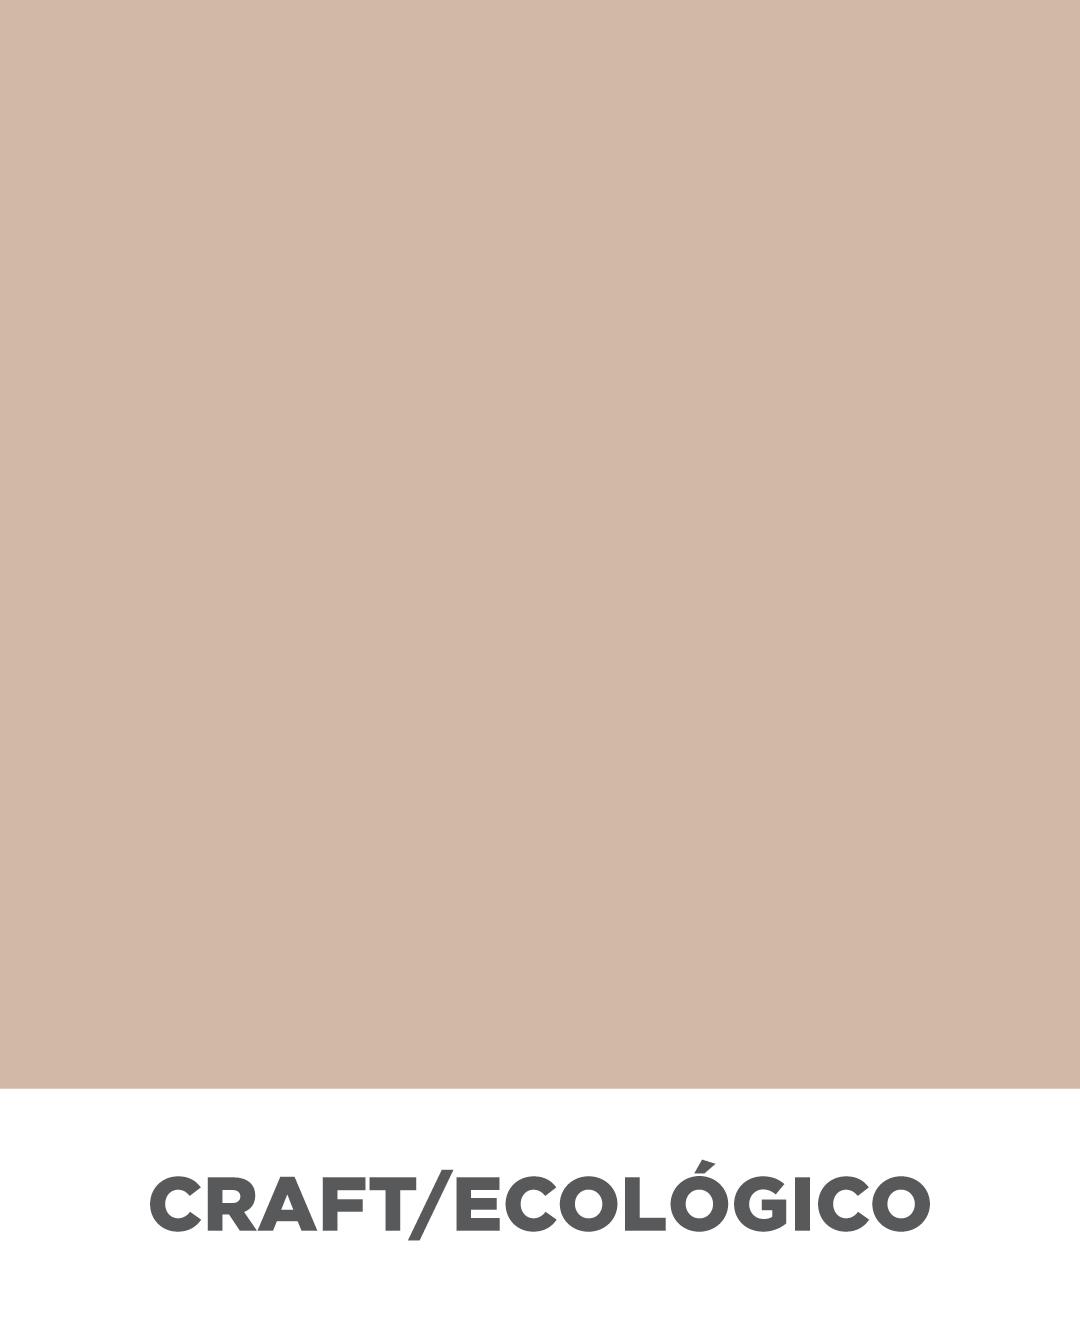 Craft/Ecológico